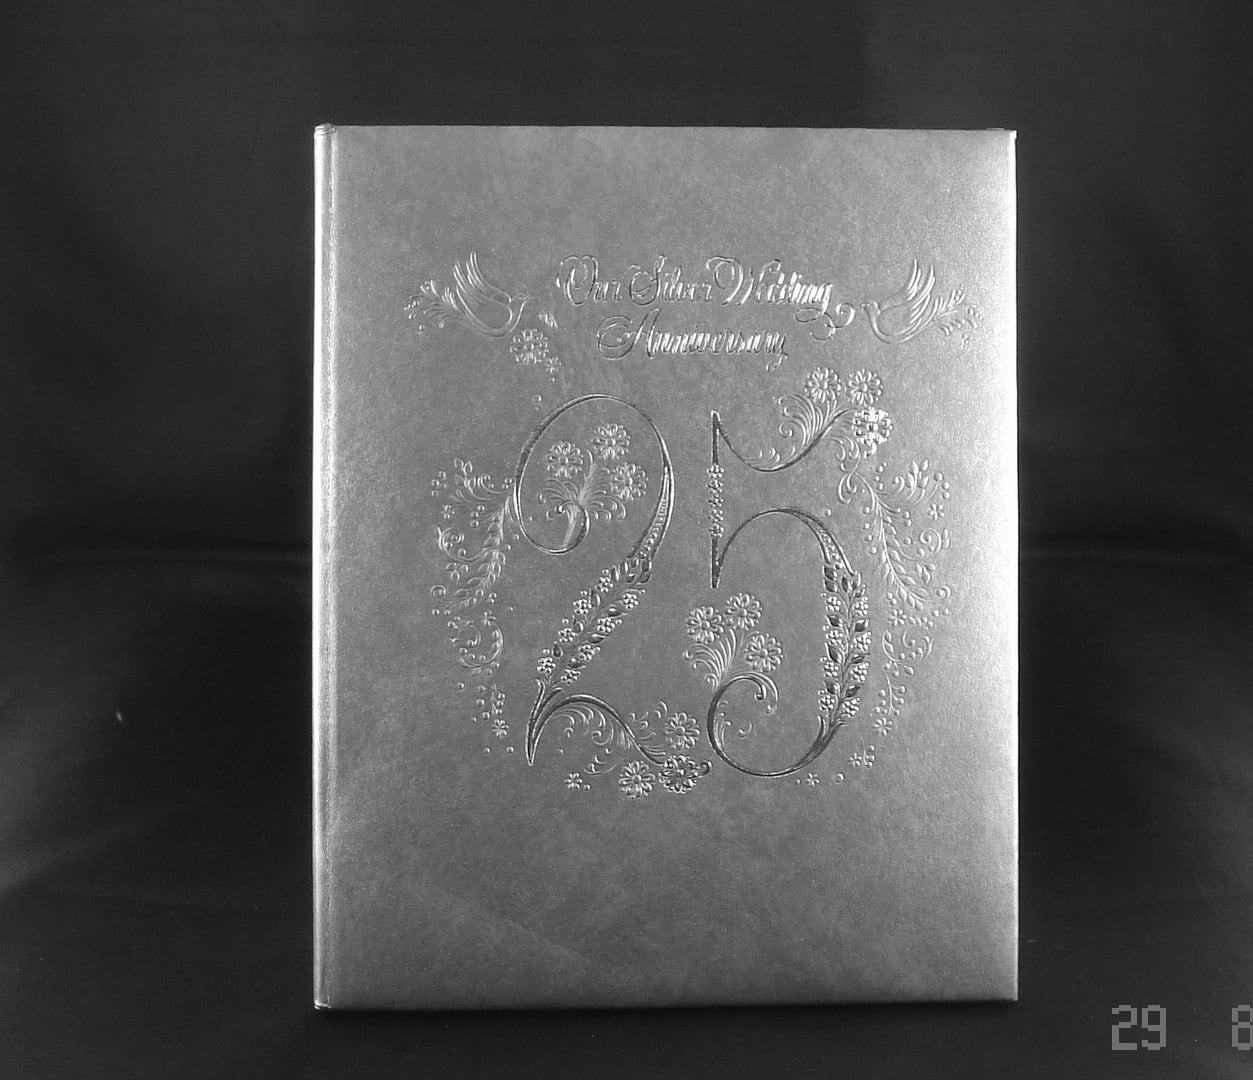 Hallmark Wedding Album: Silver Anniversary Album 25TH Wedding Memory Book 'Our